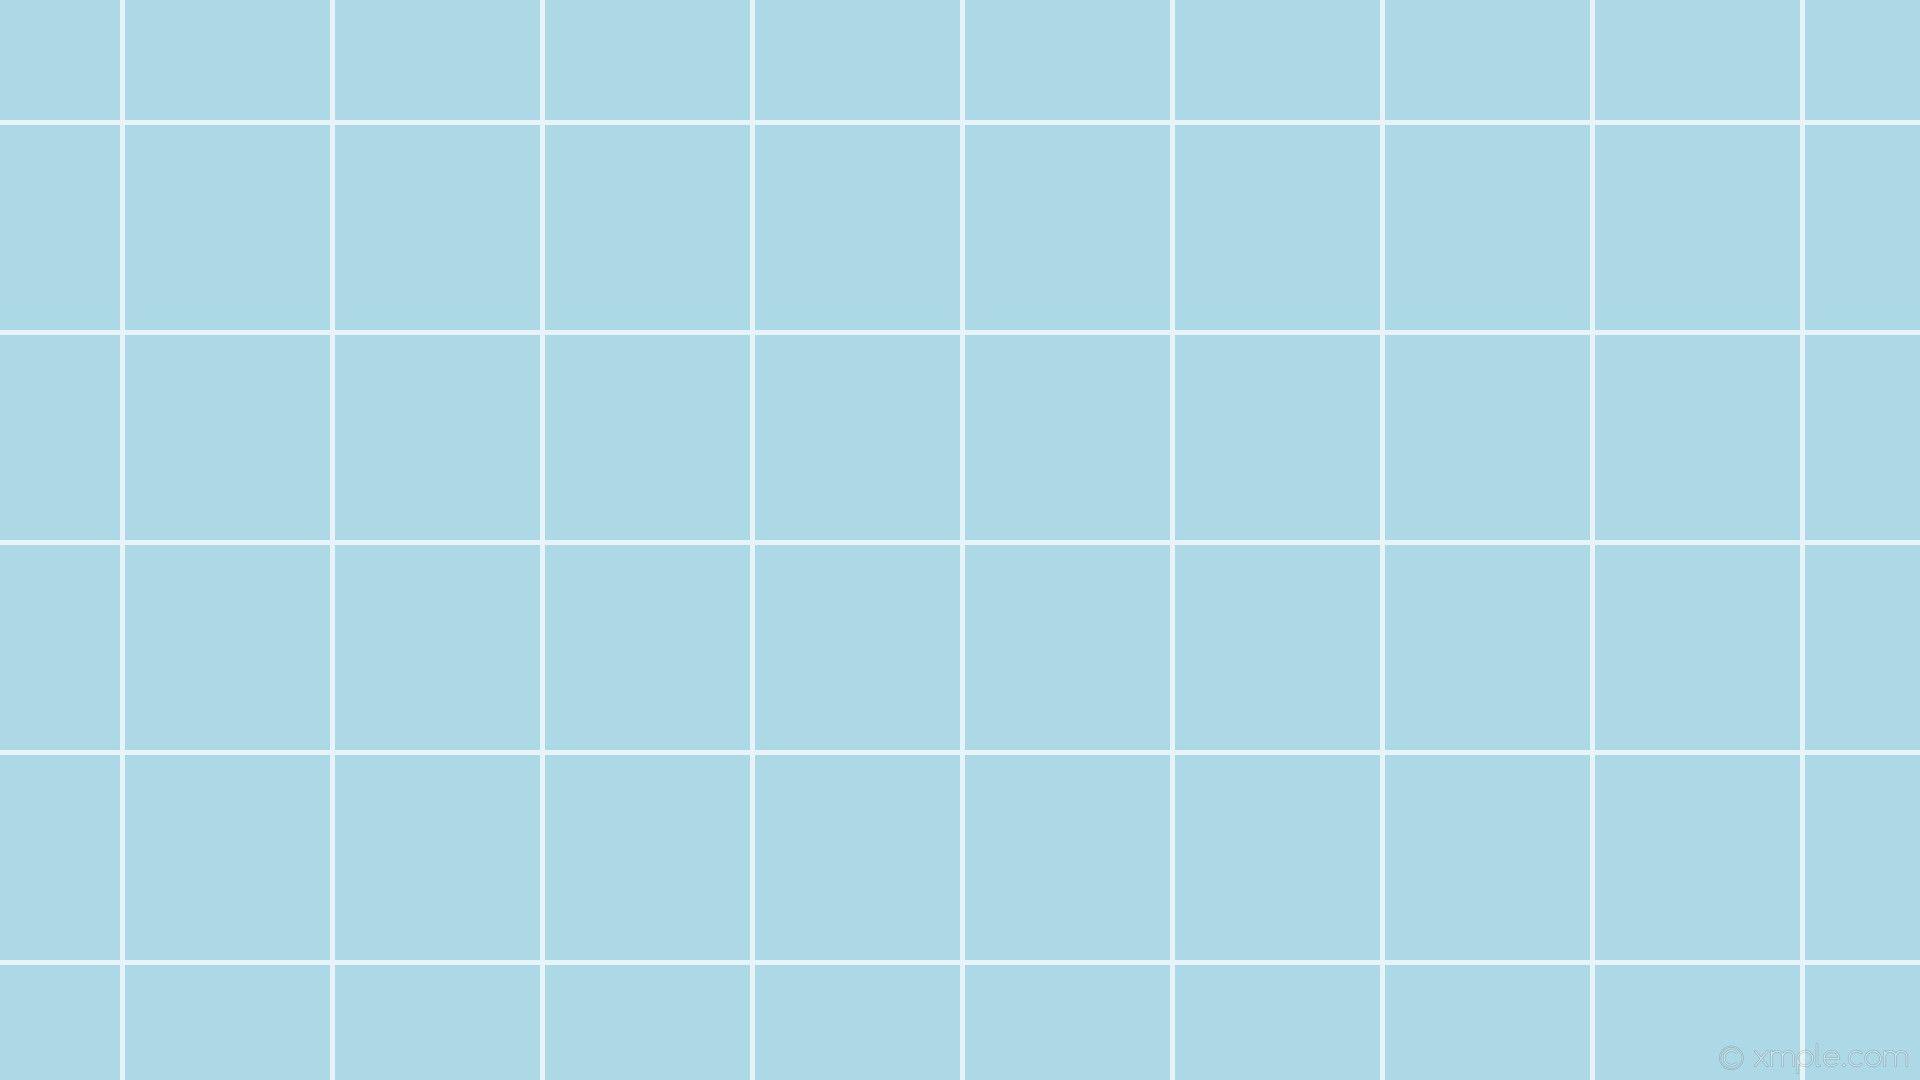 Light Blue Aesthetic Wallpapers Top Free Light Blue